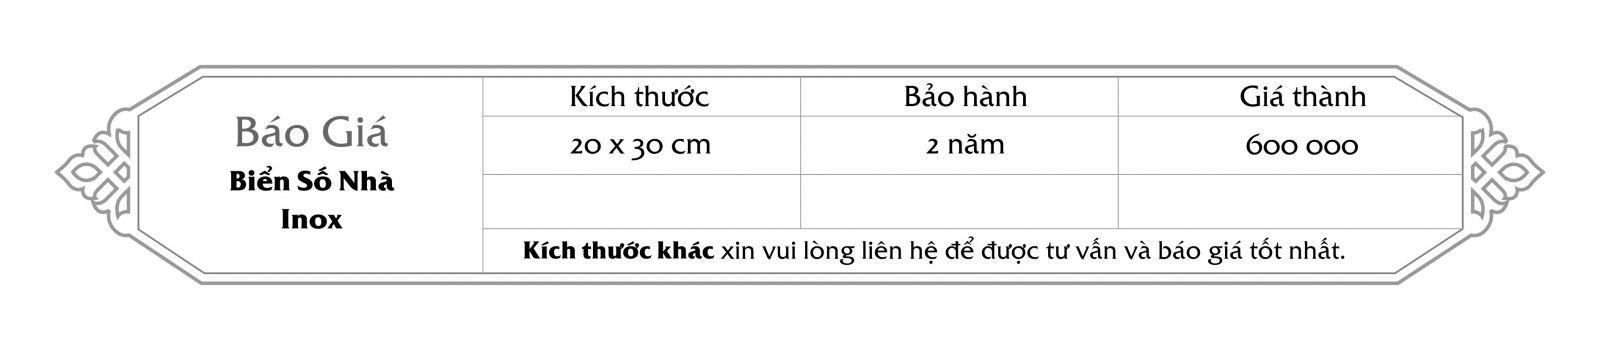 Bao-gia-bien-so-nha